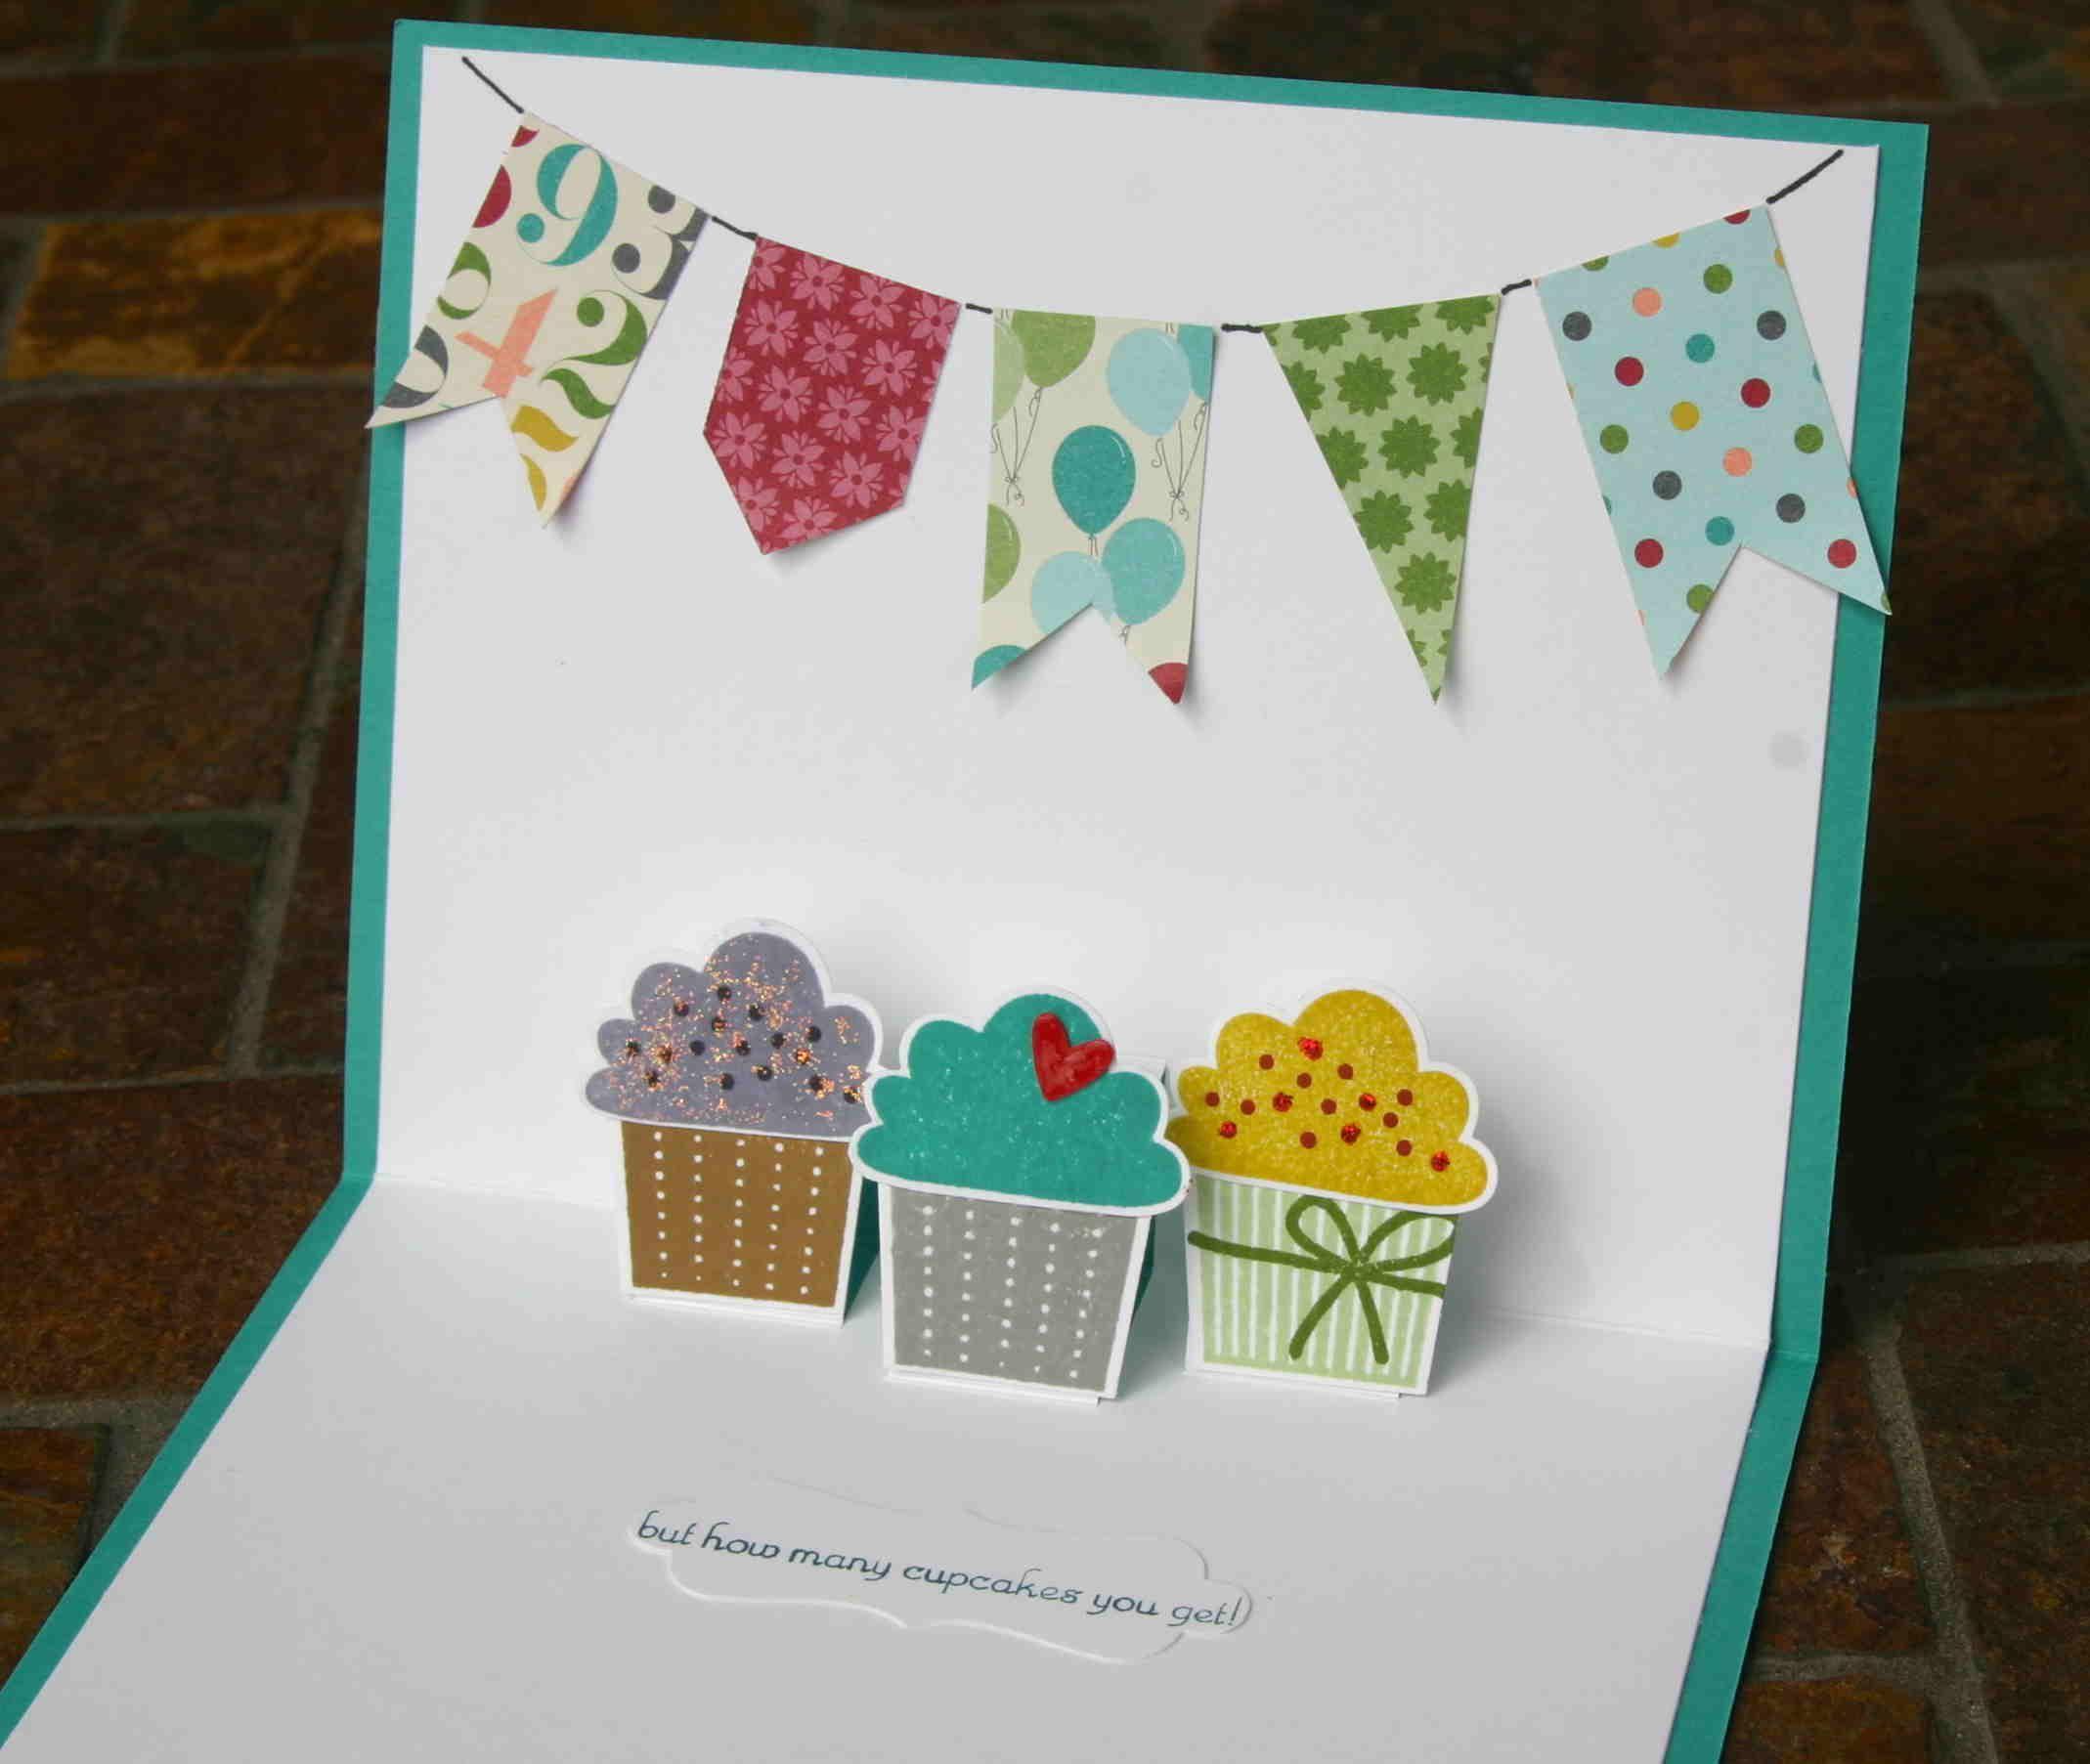 Diy Pop Up Birthday Card W Cupcakes Cupcake Birthday Cards Birthday Card Craft Birthday Cards Diy